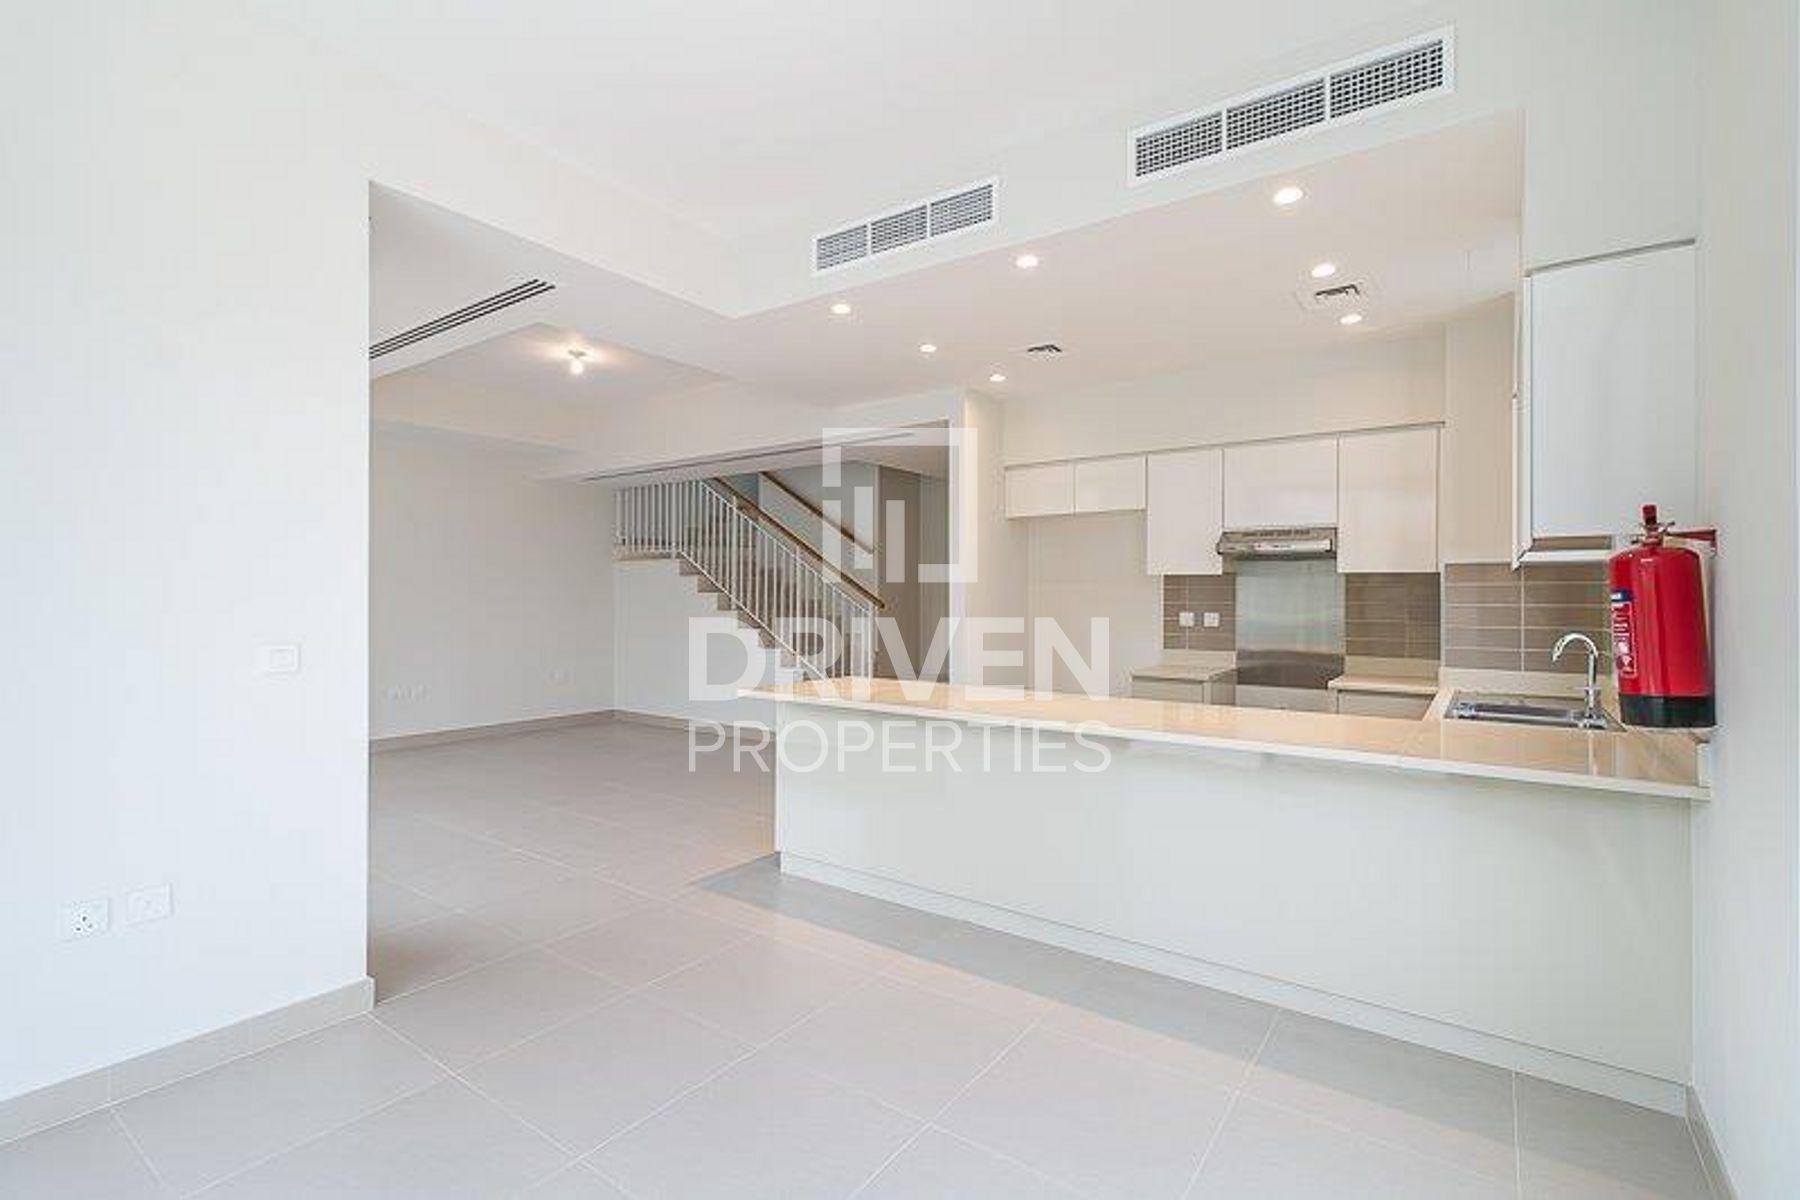 Townhouse for Rent in Maple 1 - Dubai Hills Estate